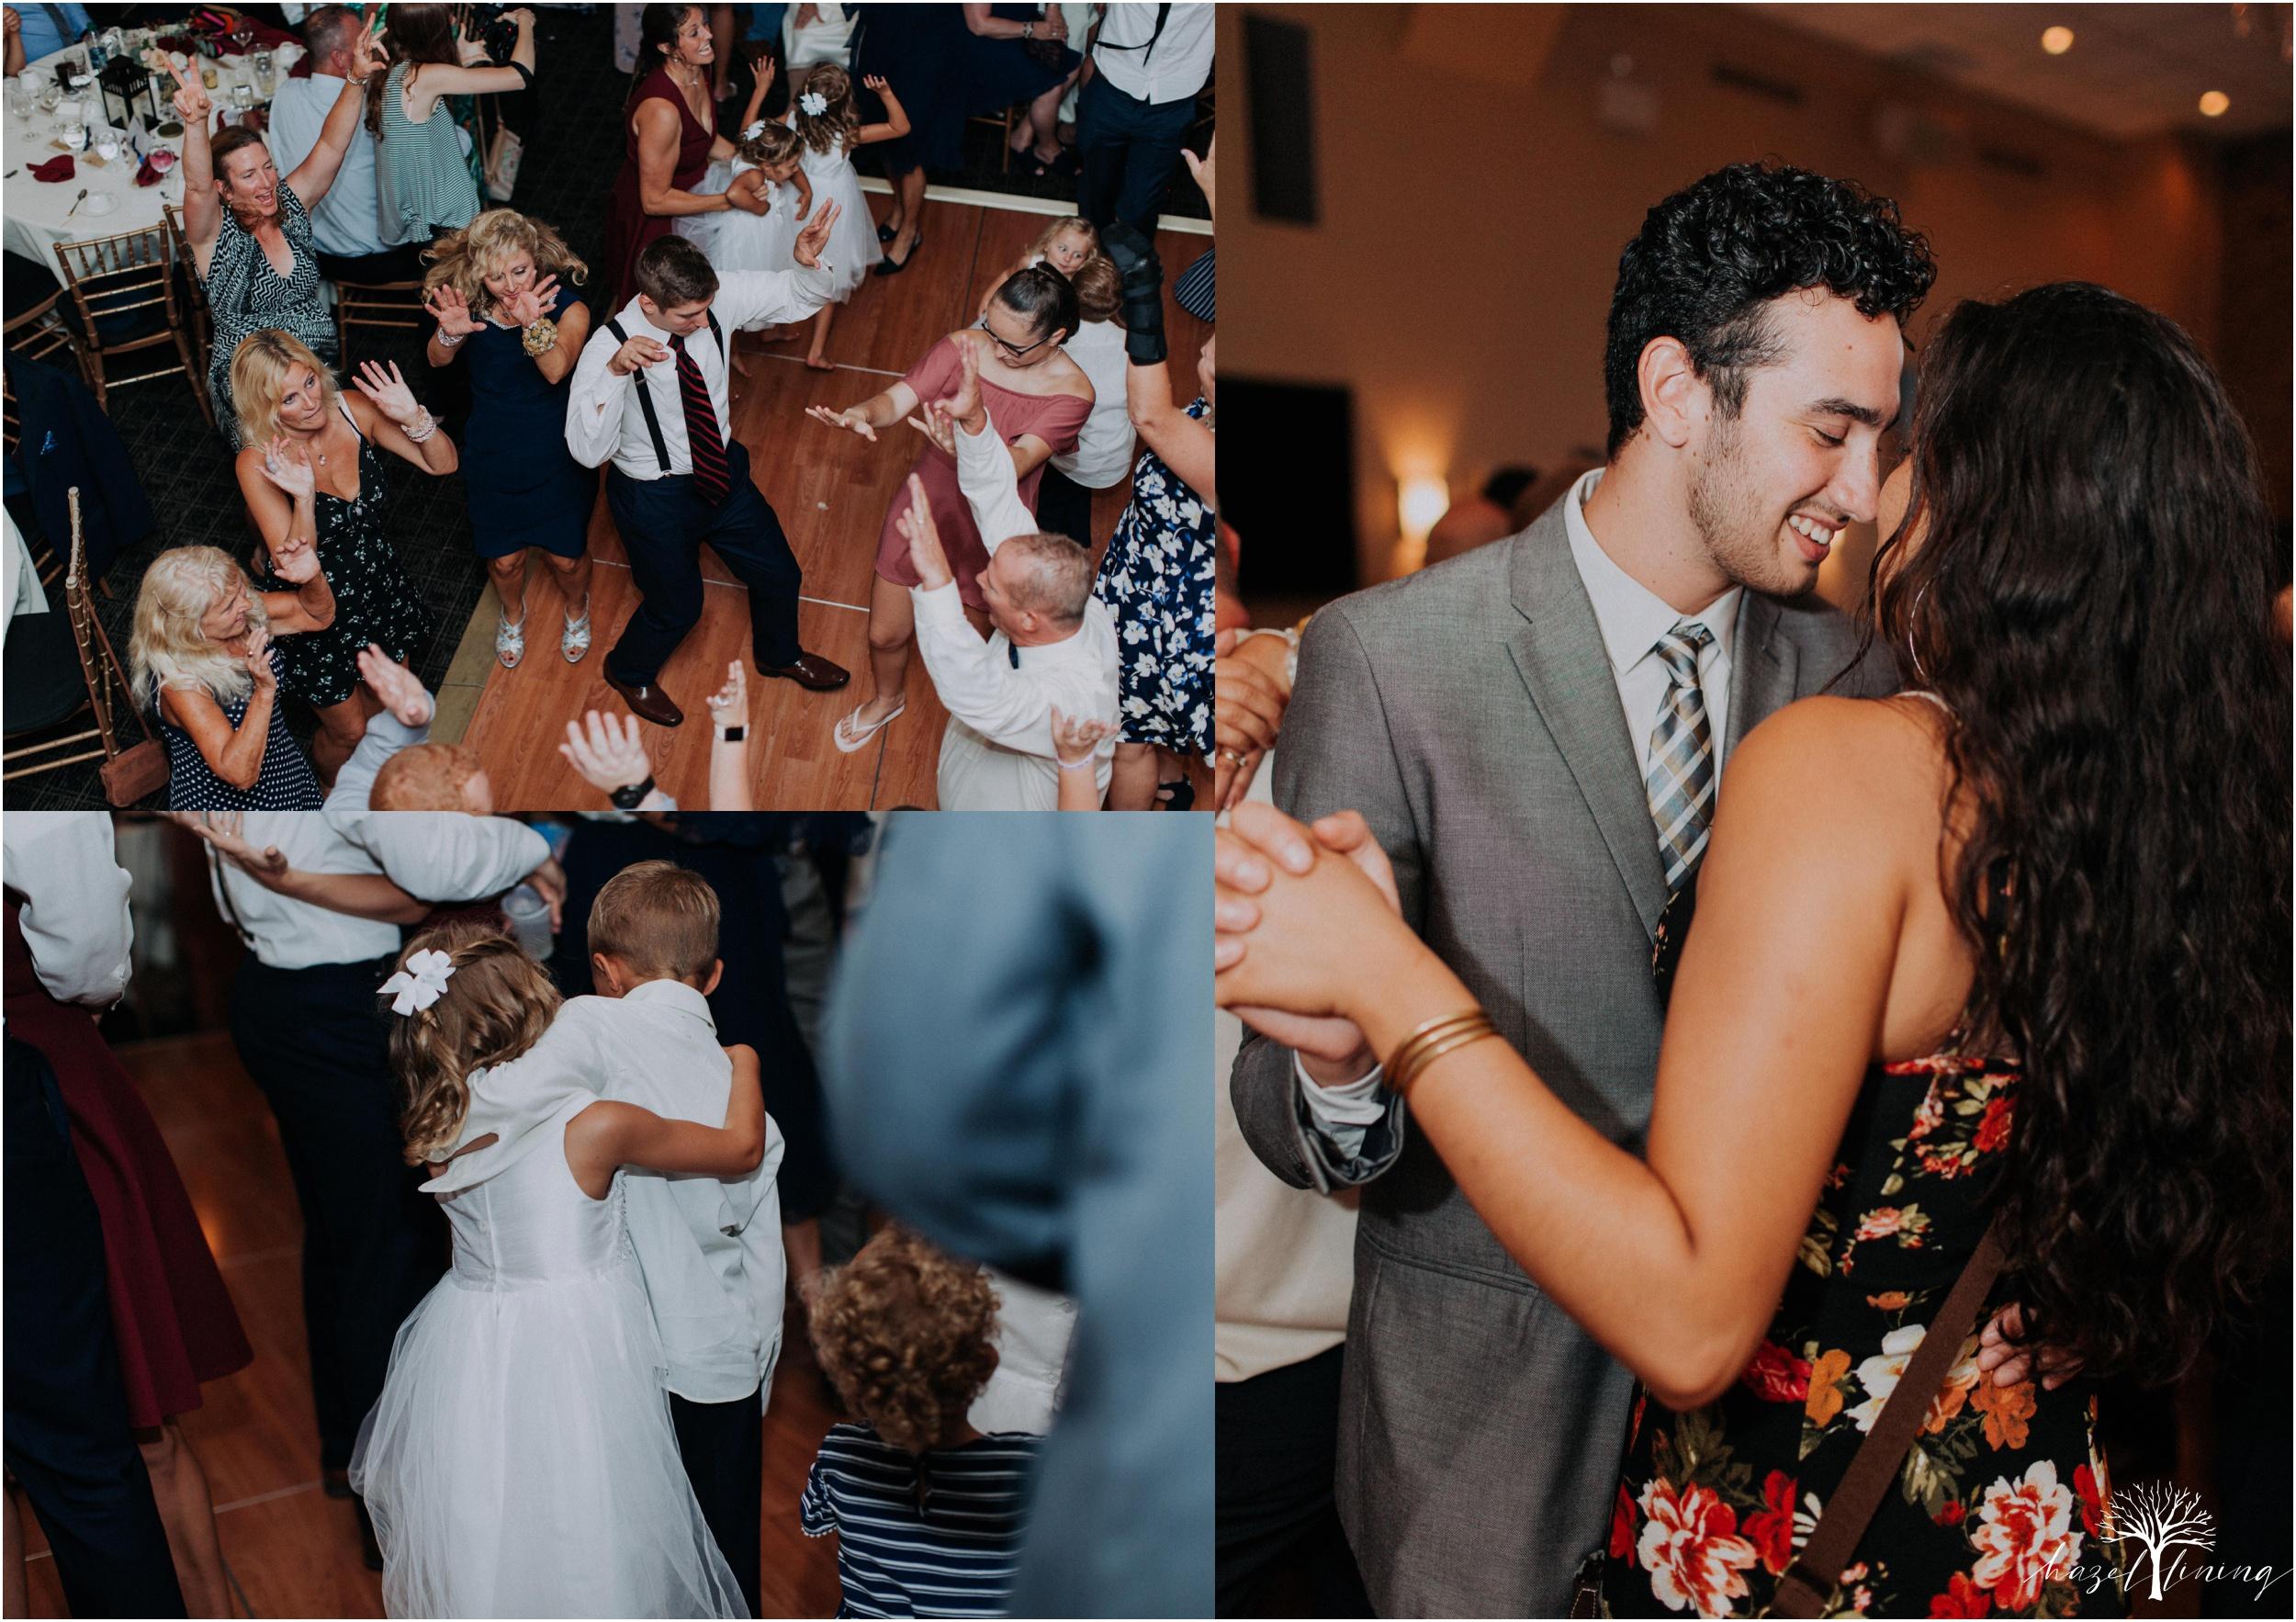 jonathan-weibel-becky-haywood-loft-at-sweetwater-cc-pennsburg-pennsylvania-rainy-day-summer-wedding-hazel-lining-travel-wedding-elopement-photography_0125.jpg